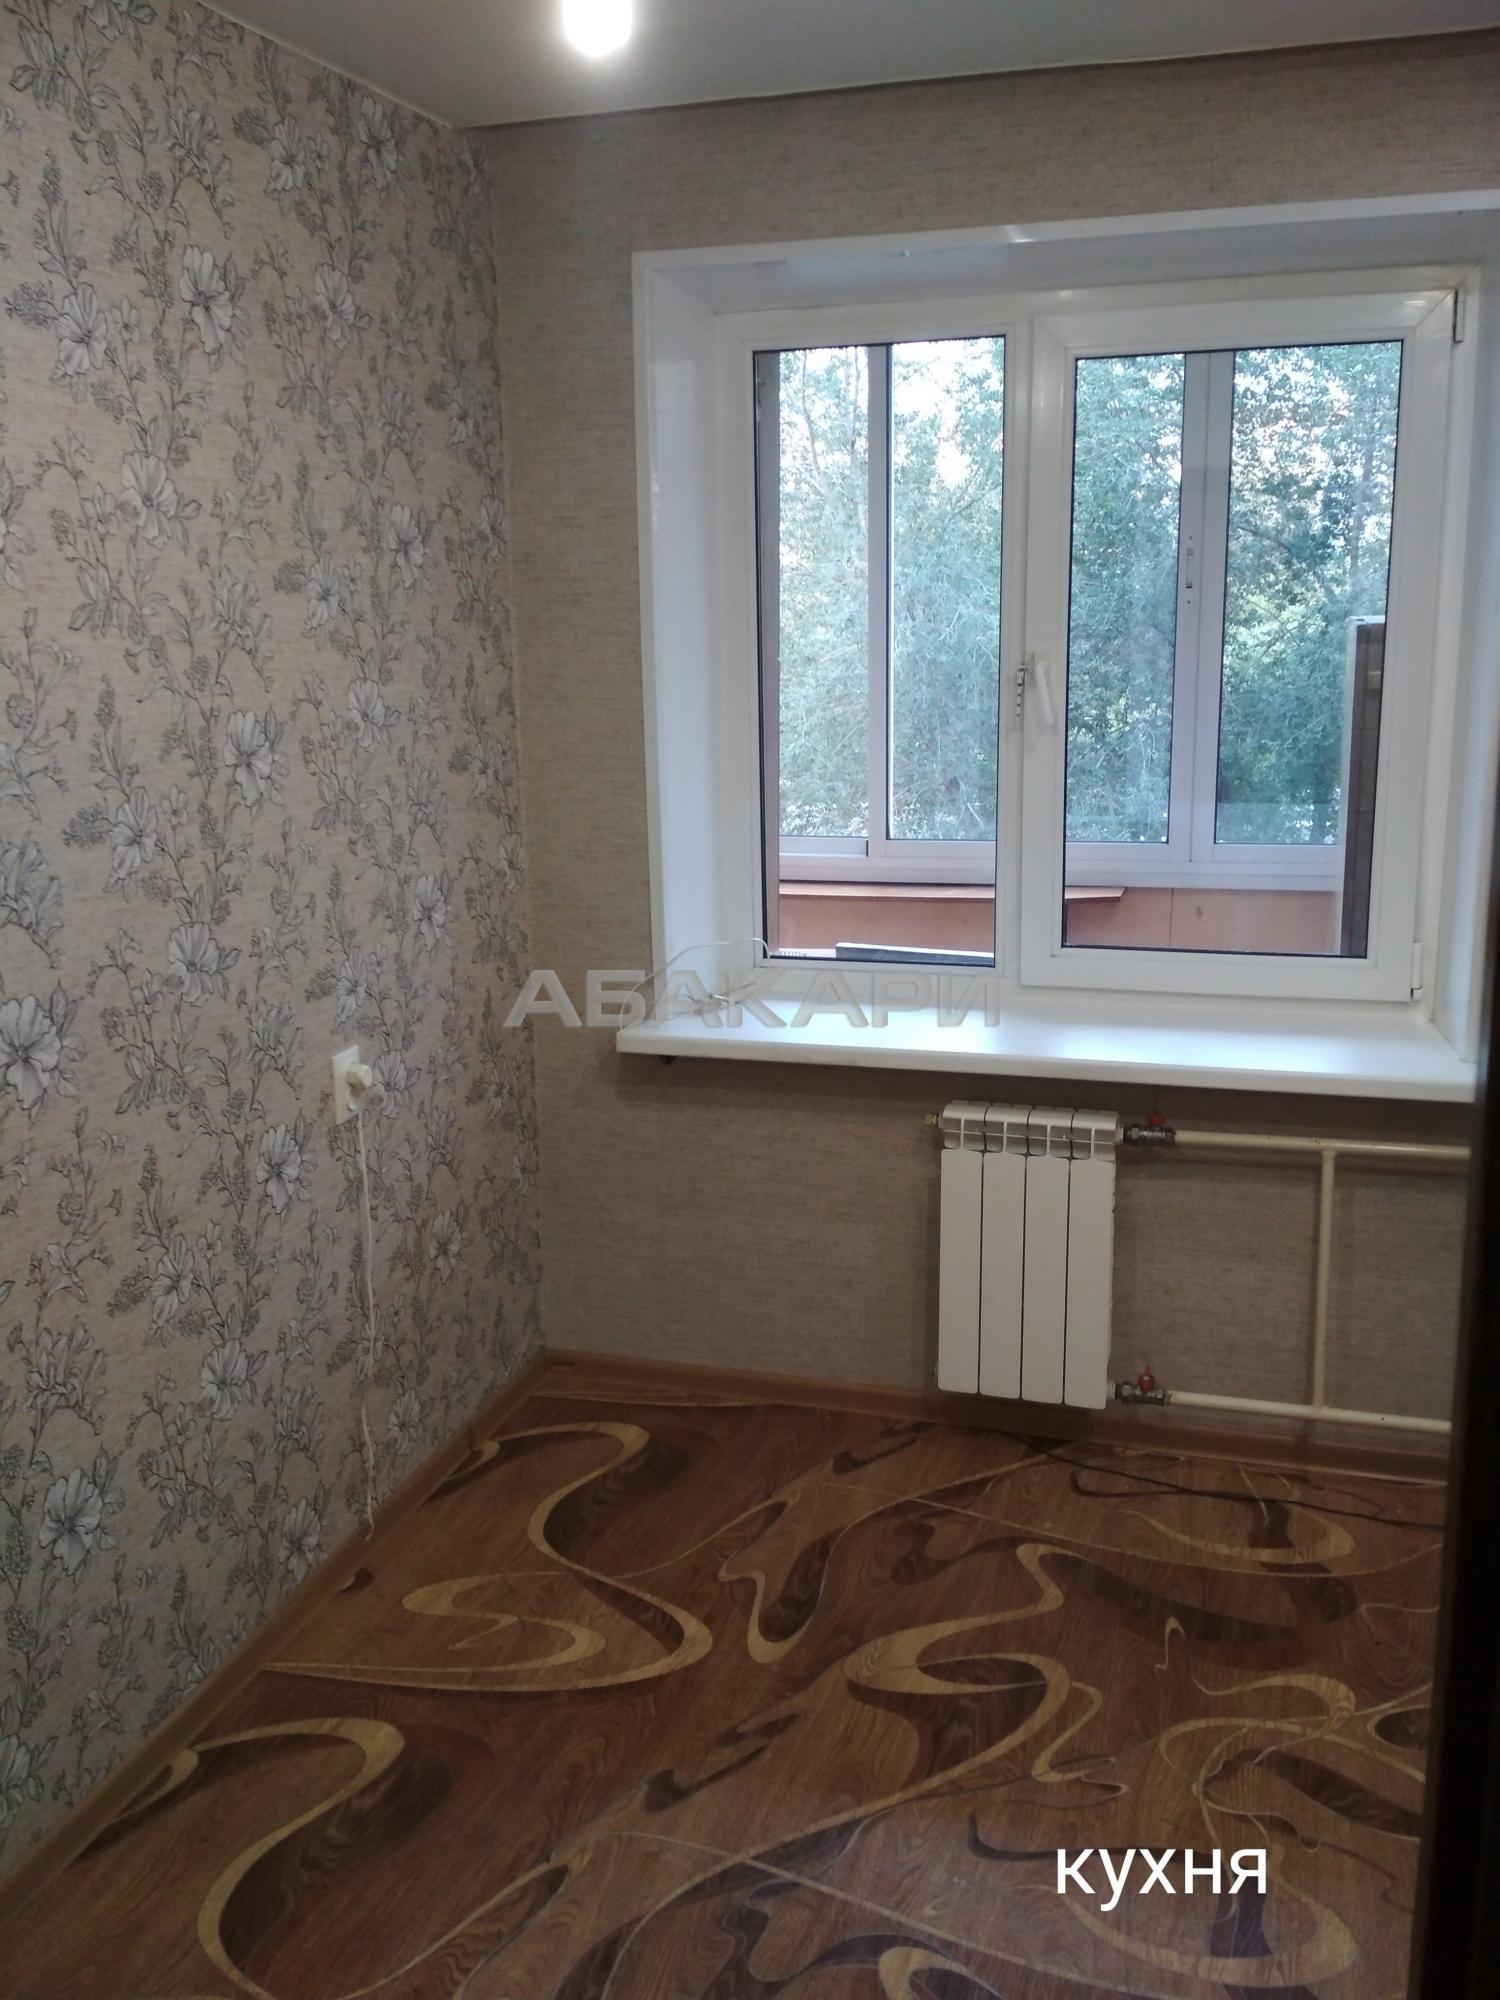 1к квартира Московская улица, 13 | 12000 | аренда в Красноярске фото 3